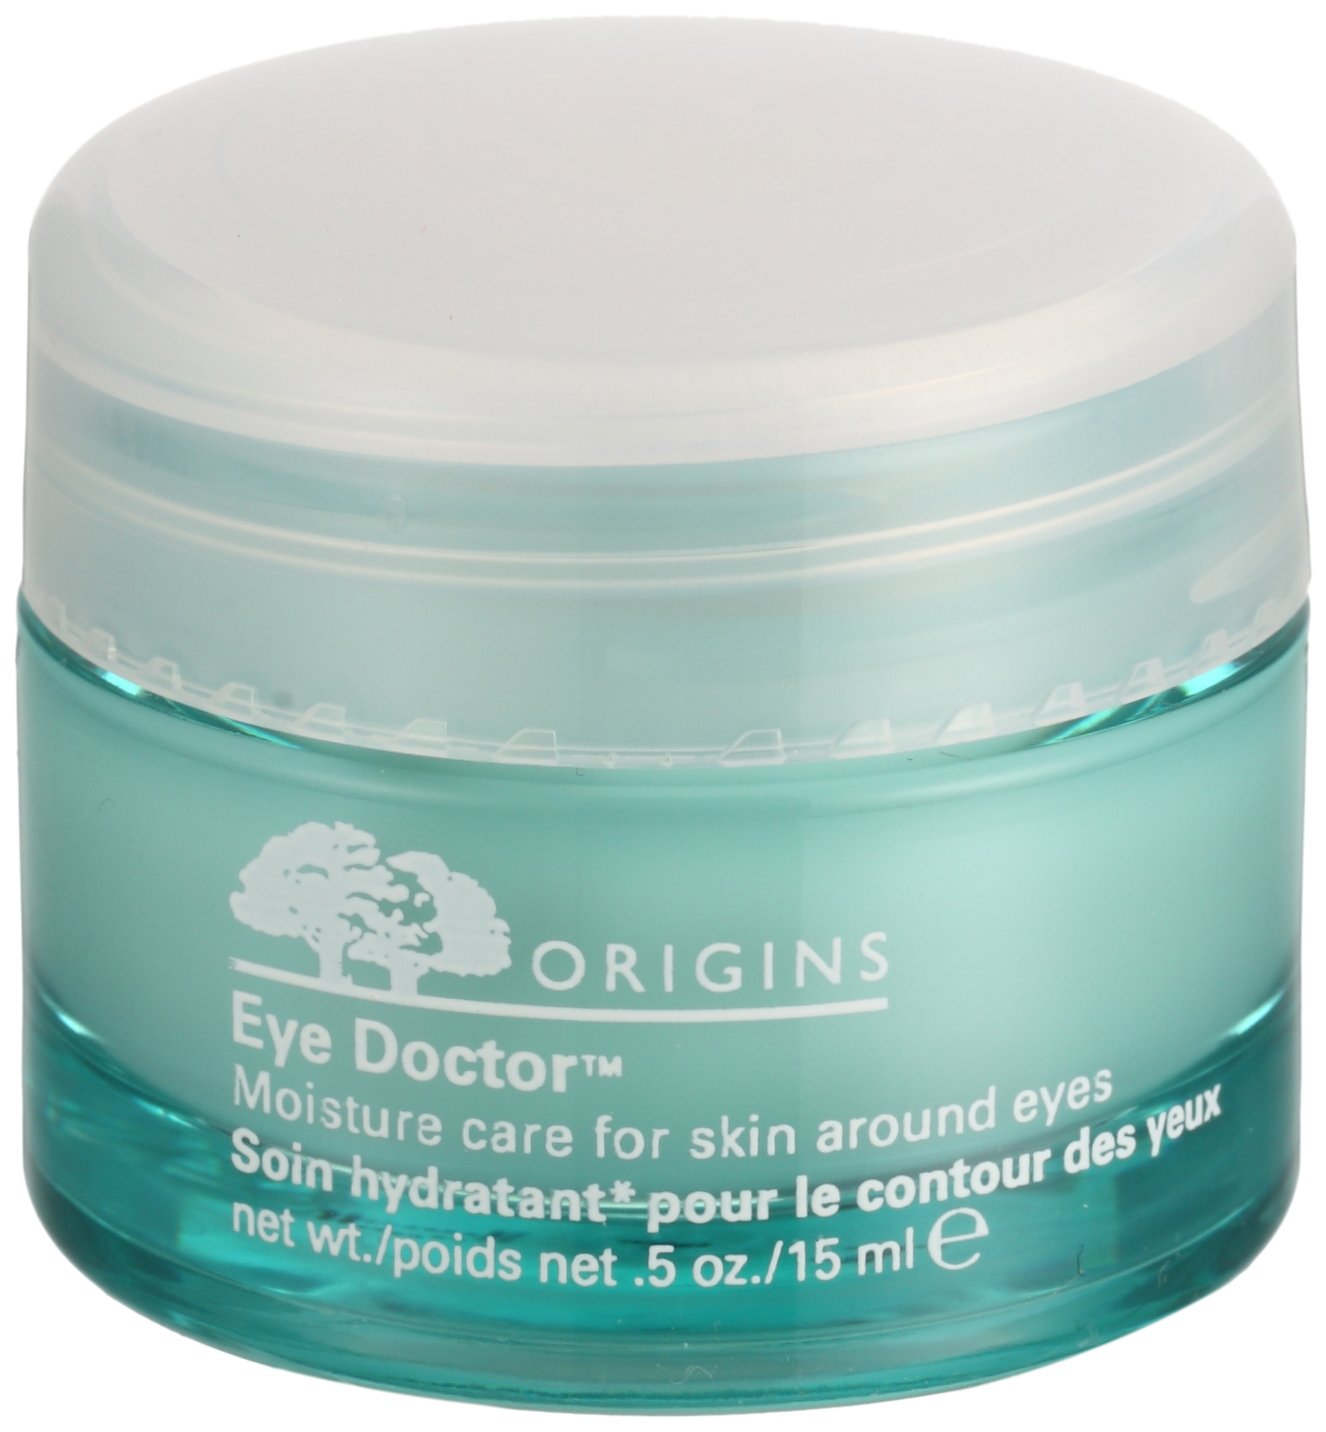 Origins Eye Doctor Moisture Care for Skin Around Eyes, 0.5 Ounces